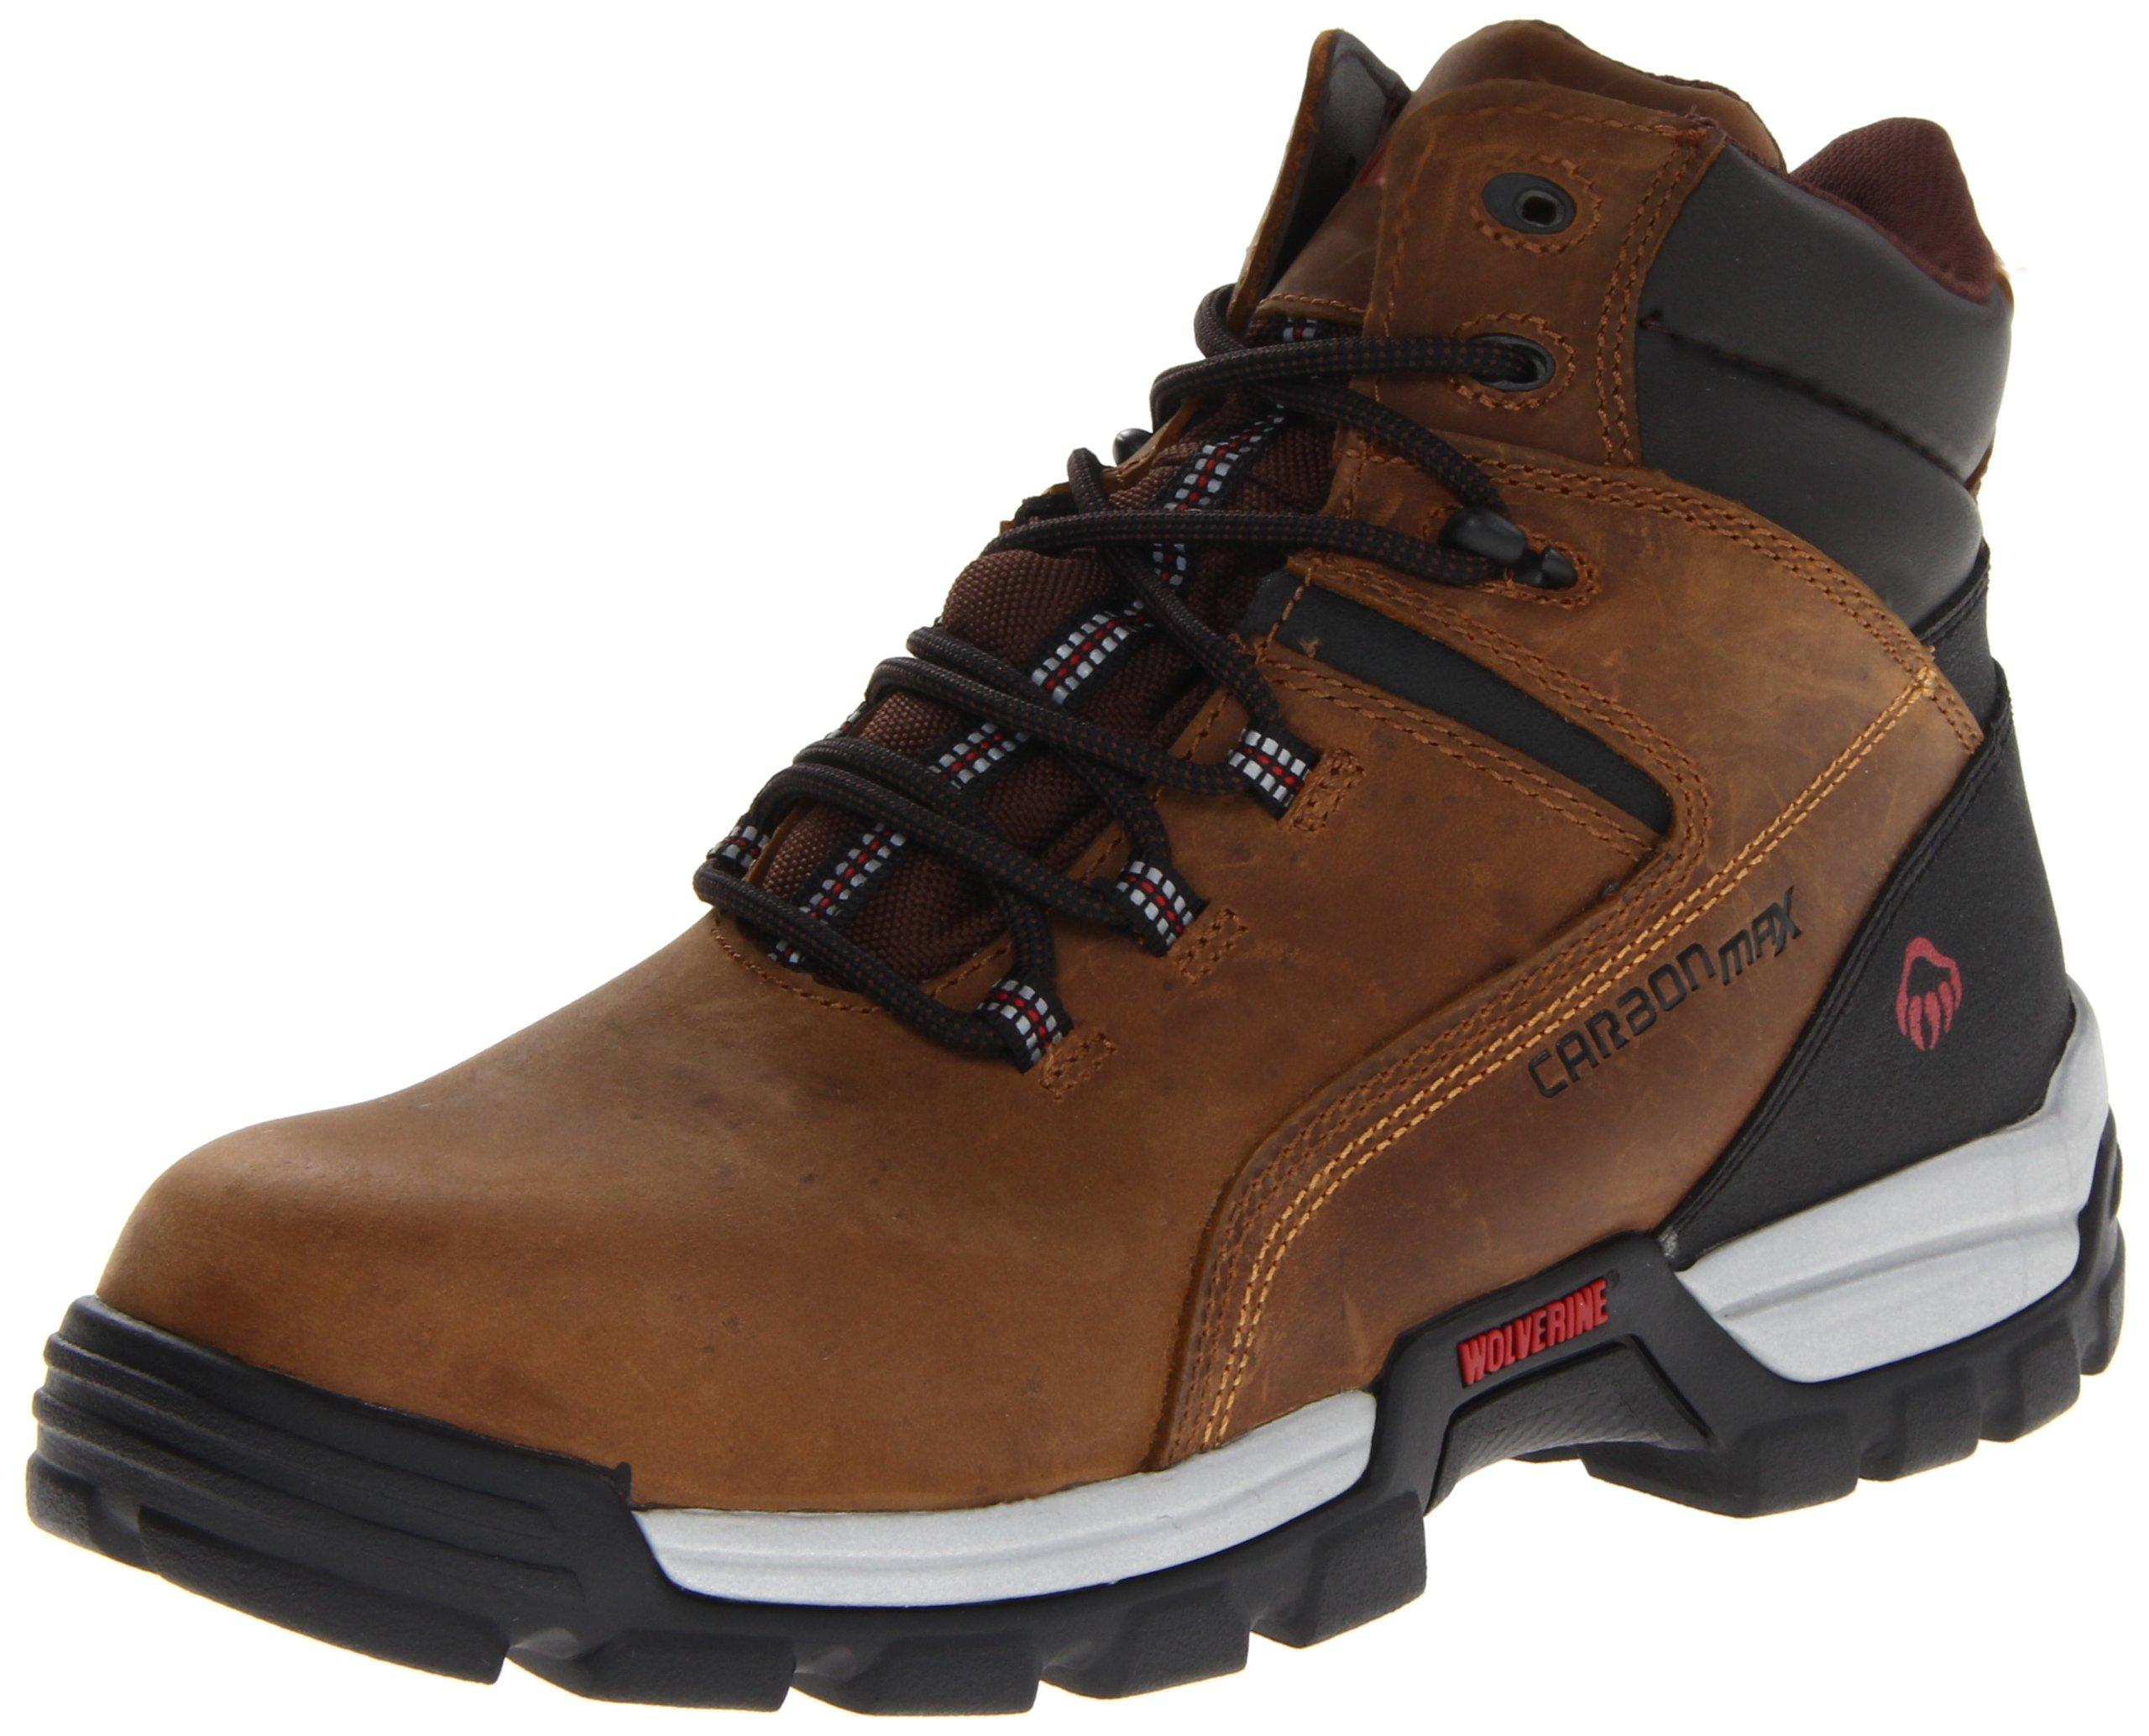 Wolverine Men's W10305 Tarmac Boot, Brown, 7.5 M US